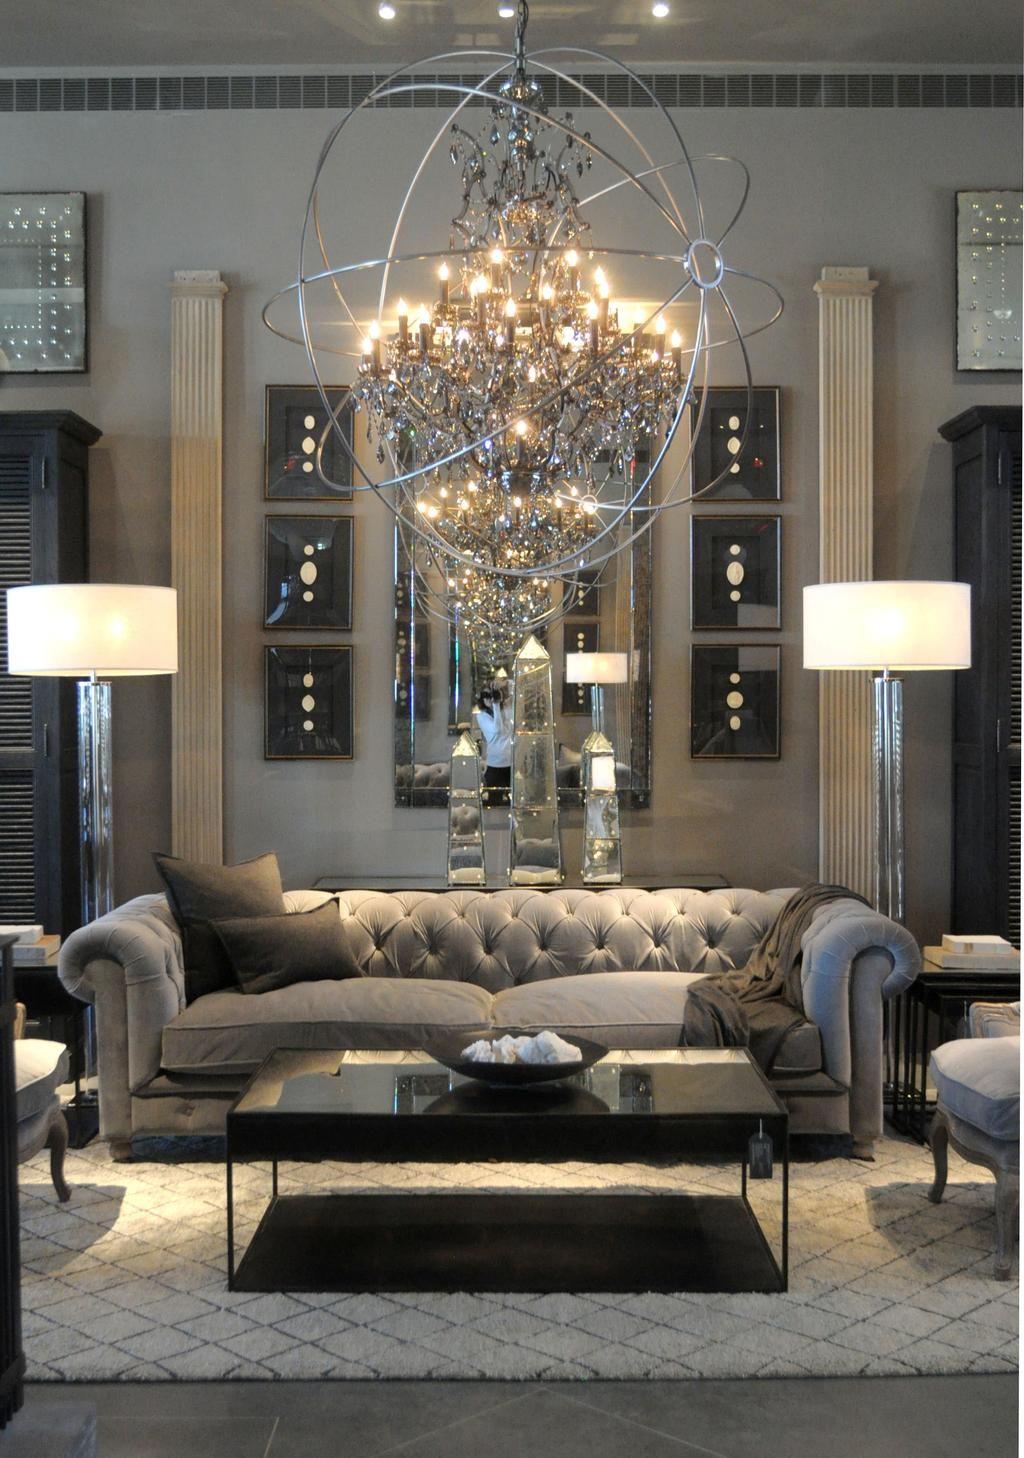 Chandelier Designs For Living Room